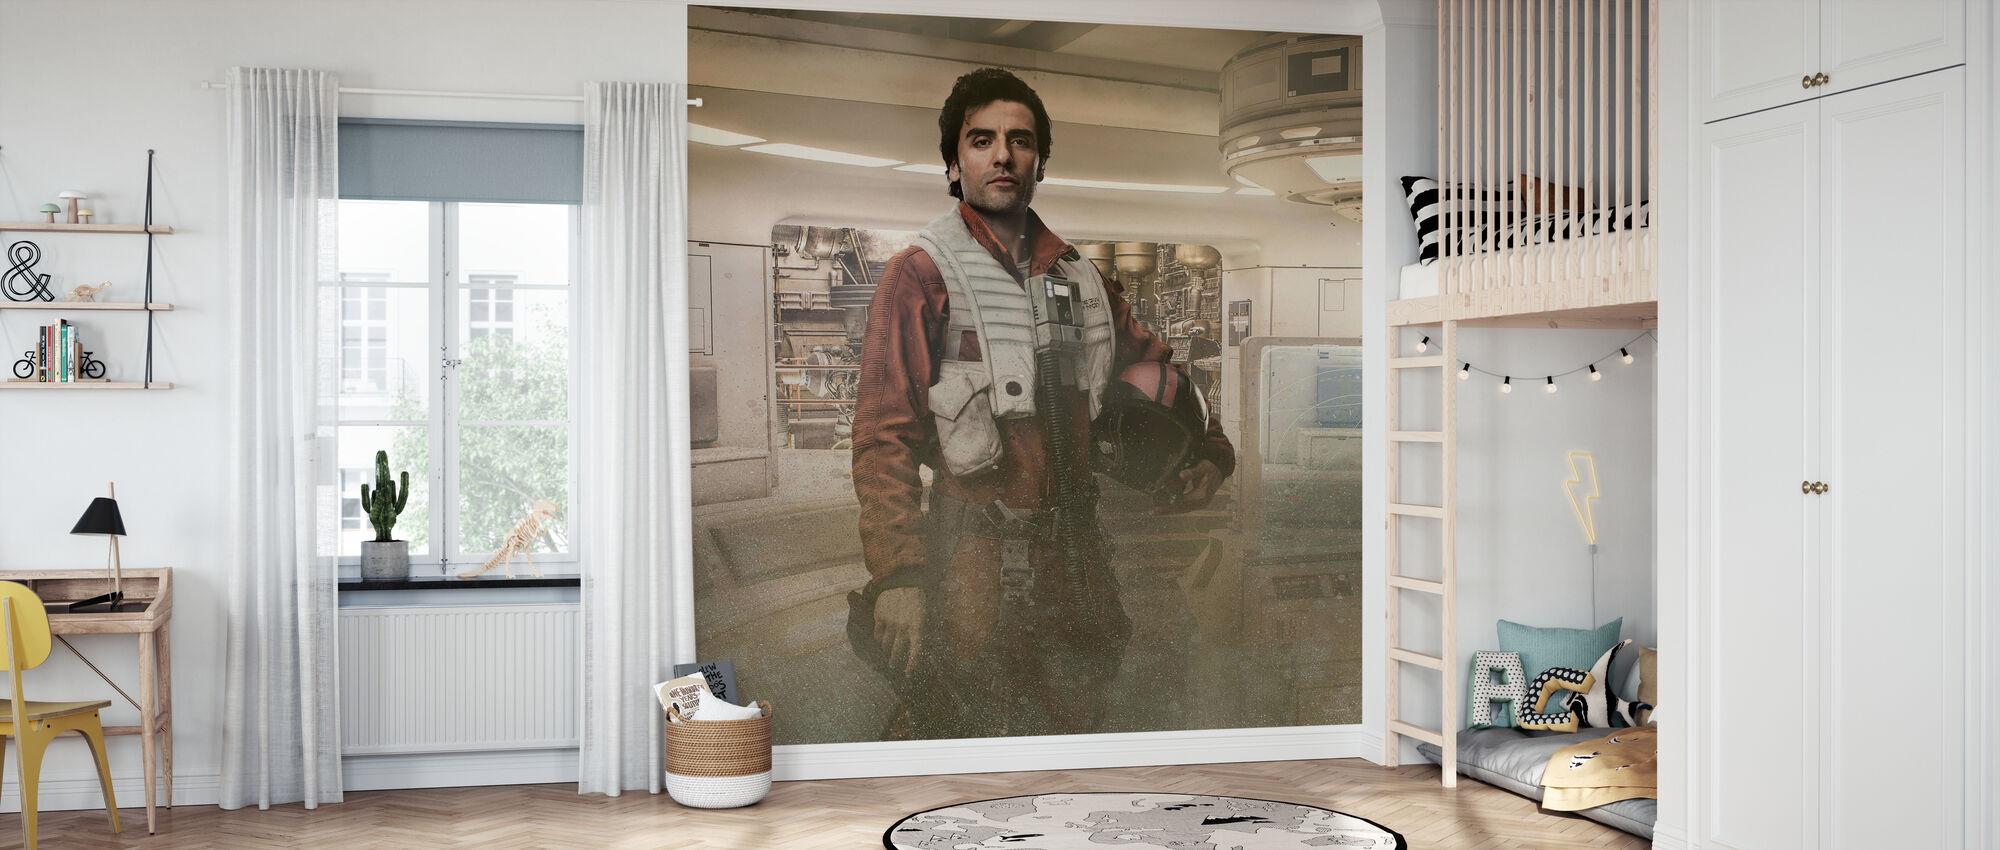 Star wars - Poe Dameron - Rebel Pilot - Tapet - Barnerom